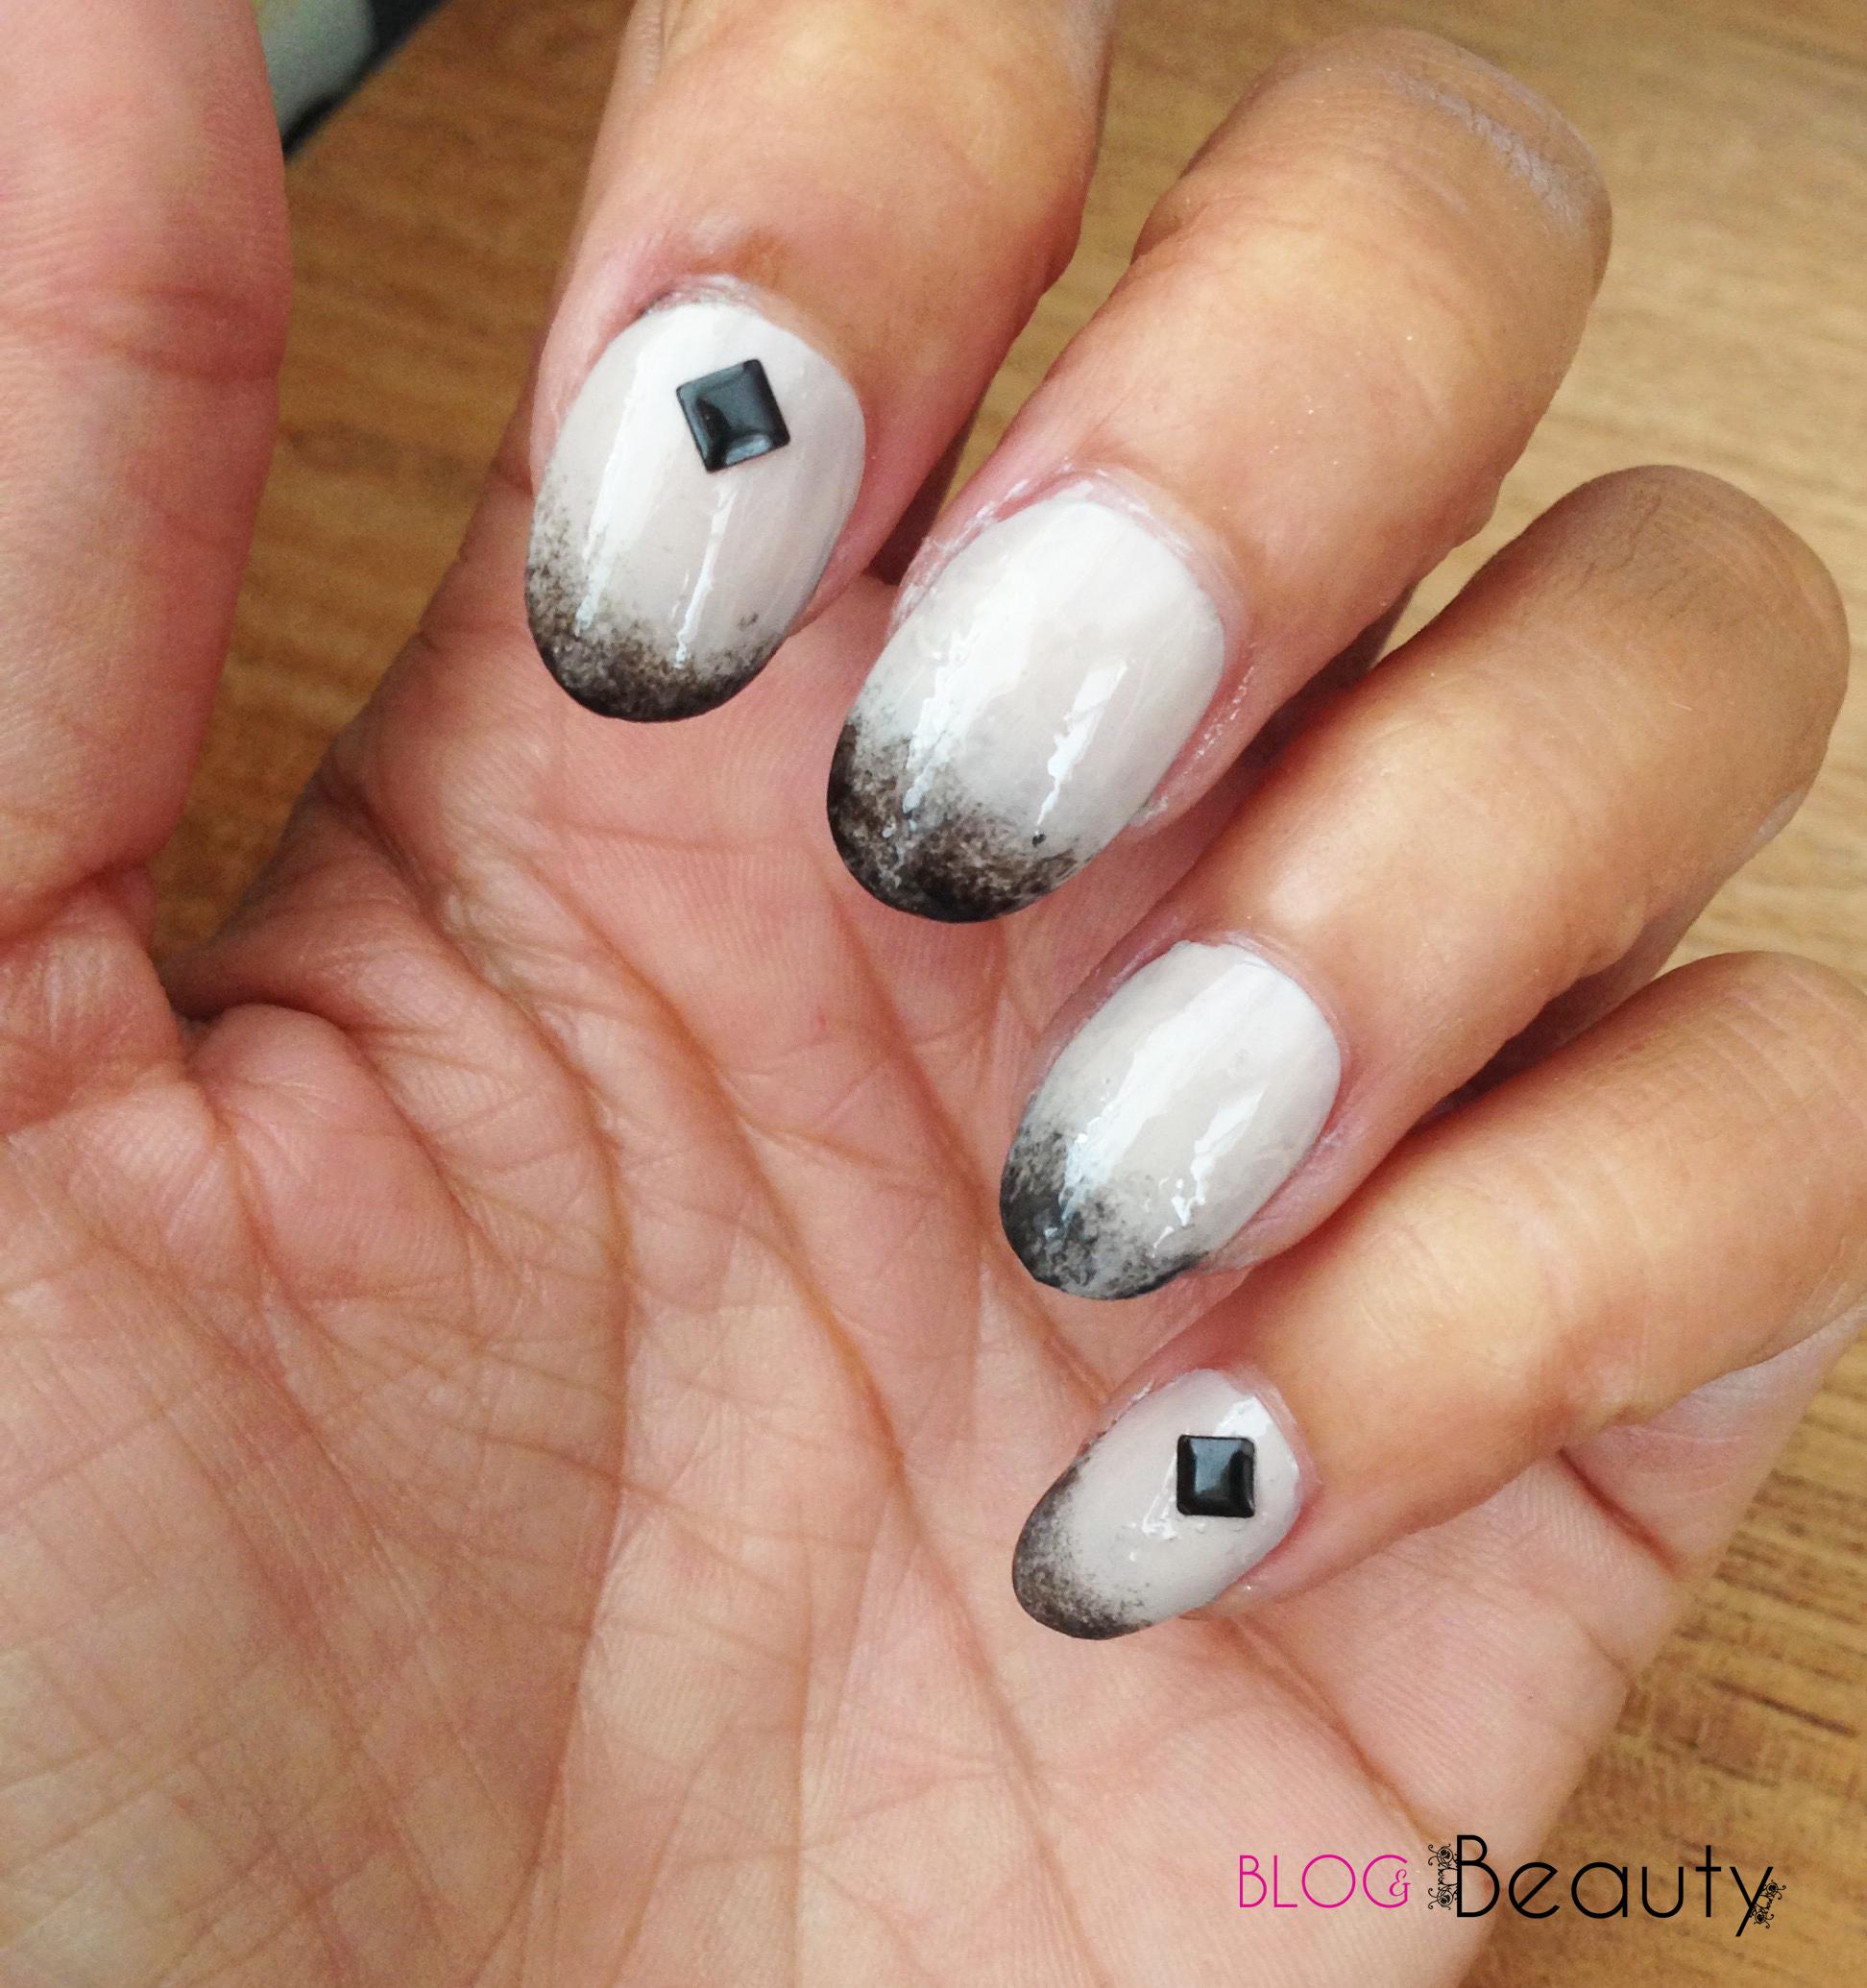 Nailscene Gradient French Manicure Blog Beauty